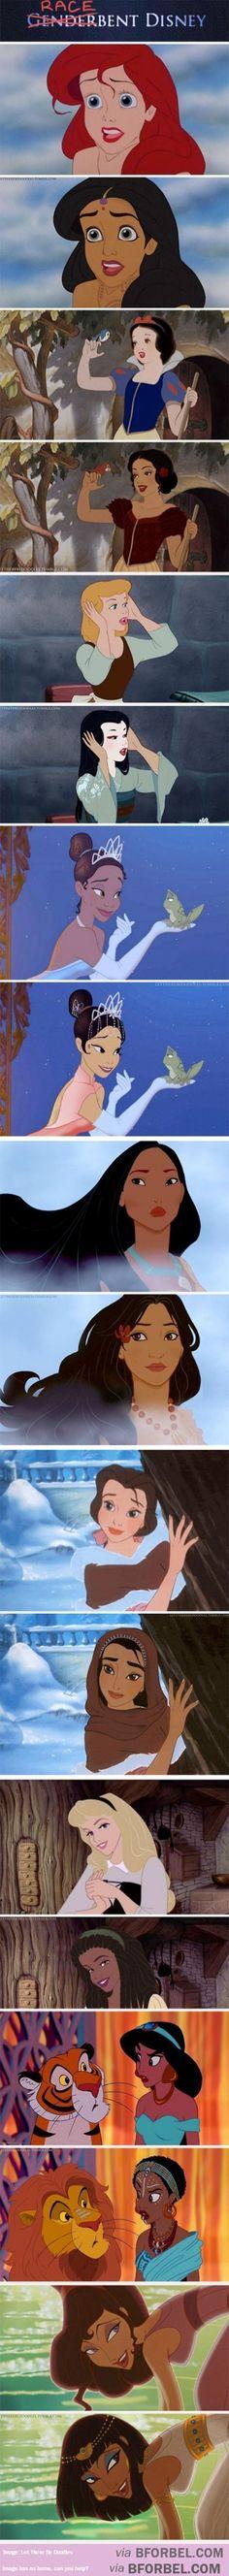 9 Disney Princesses Now Of Different Colors…